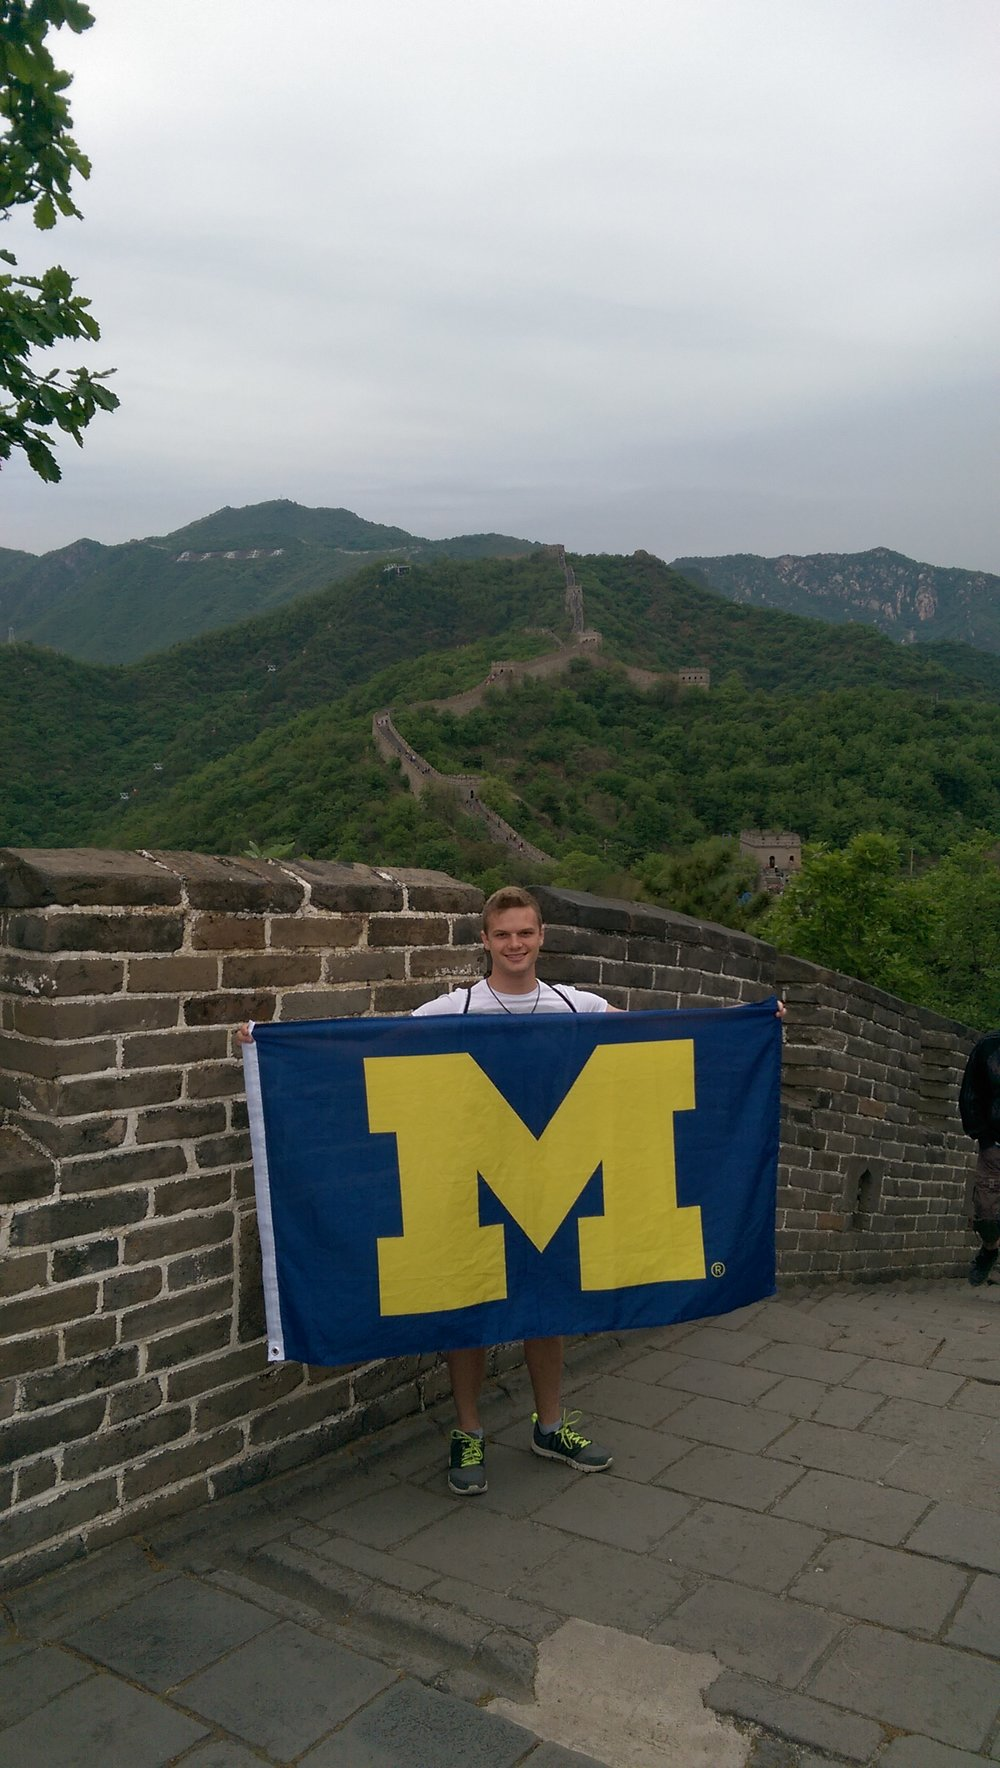 Representin' at the Great Wall